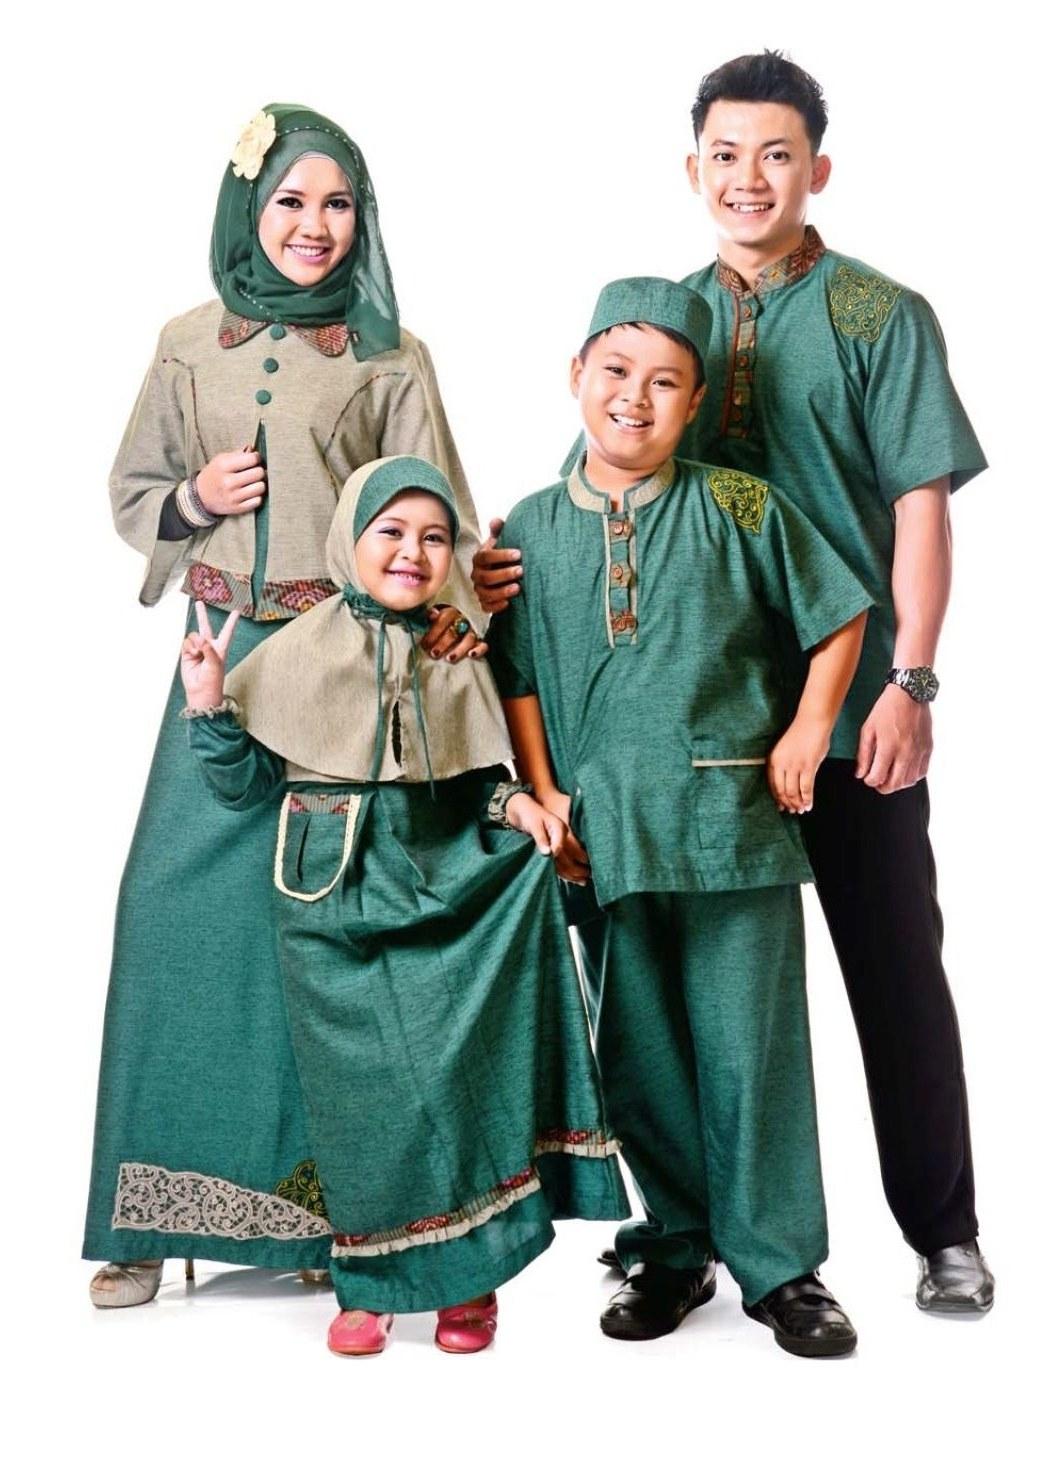 Design Trend Baju Lebaran Anak Perempuan 2018 Fmdf Baju Lebaran Keluarga 2016